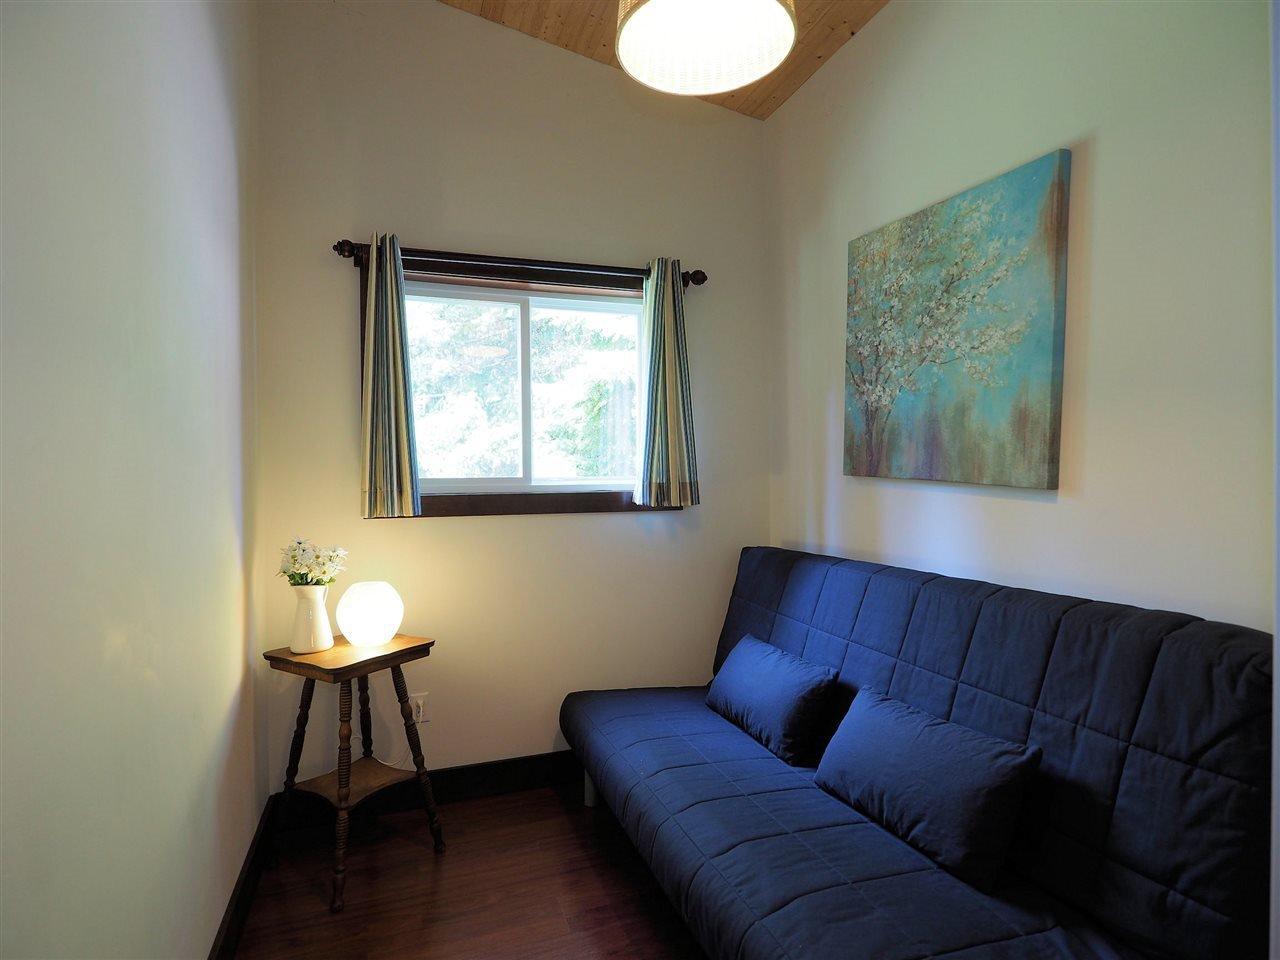 Photo 15: Photos: 8222 CENTENNIAL Road in Bridge Lake: Bridge Lake/Sheridan Lake House for sale (100 Mile House (Zone 10))  : MLS®# R2457362